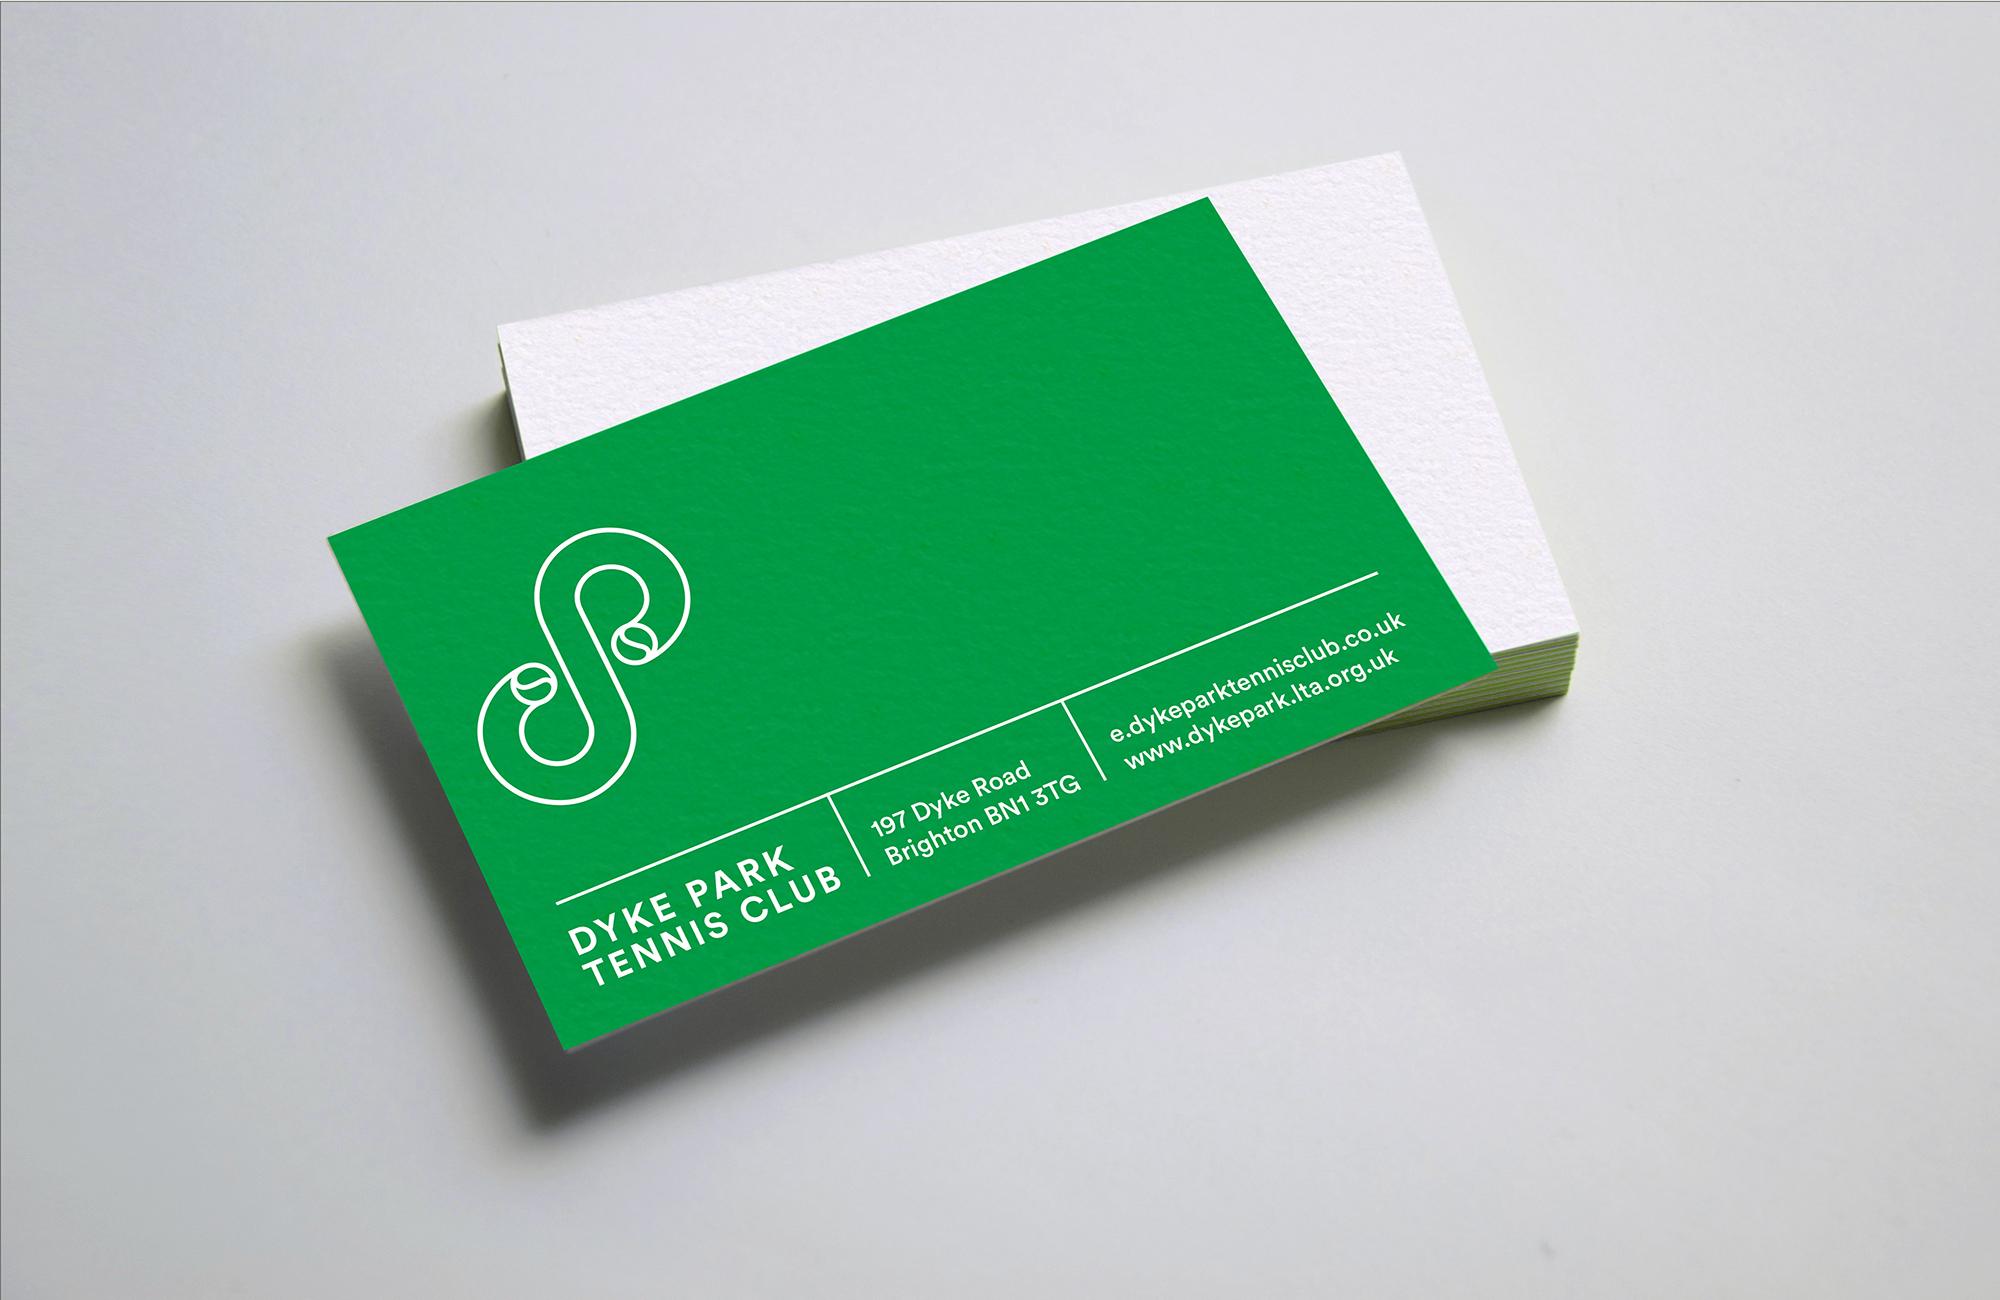 Dyke tennis bcard print